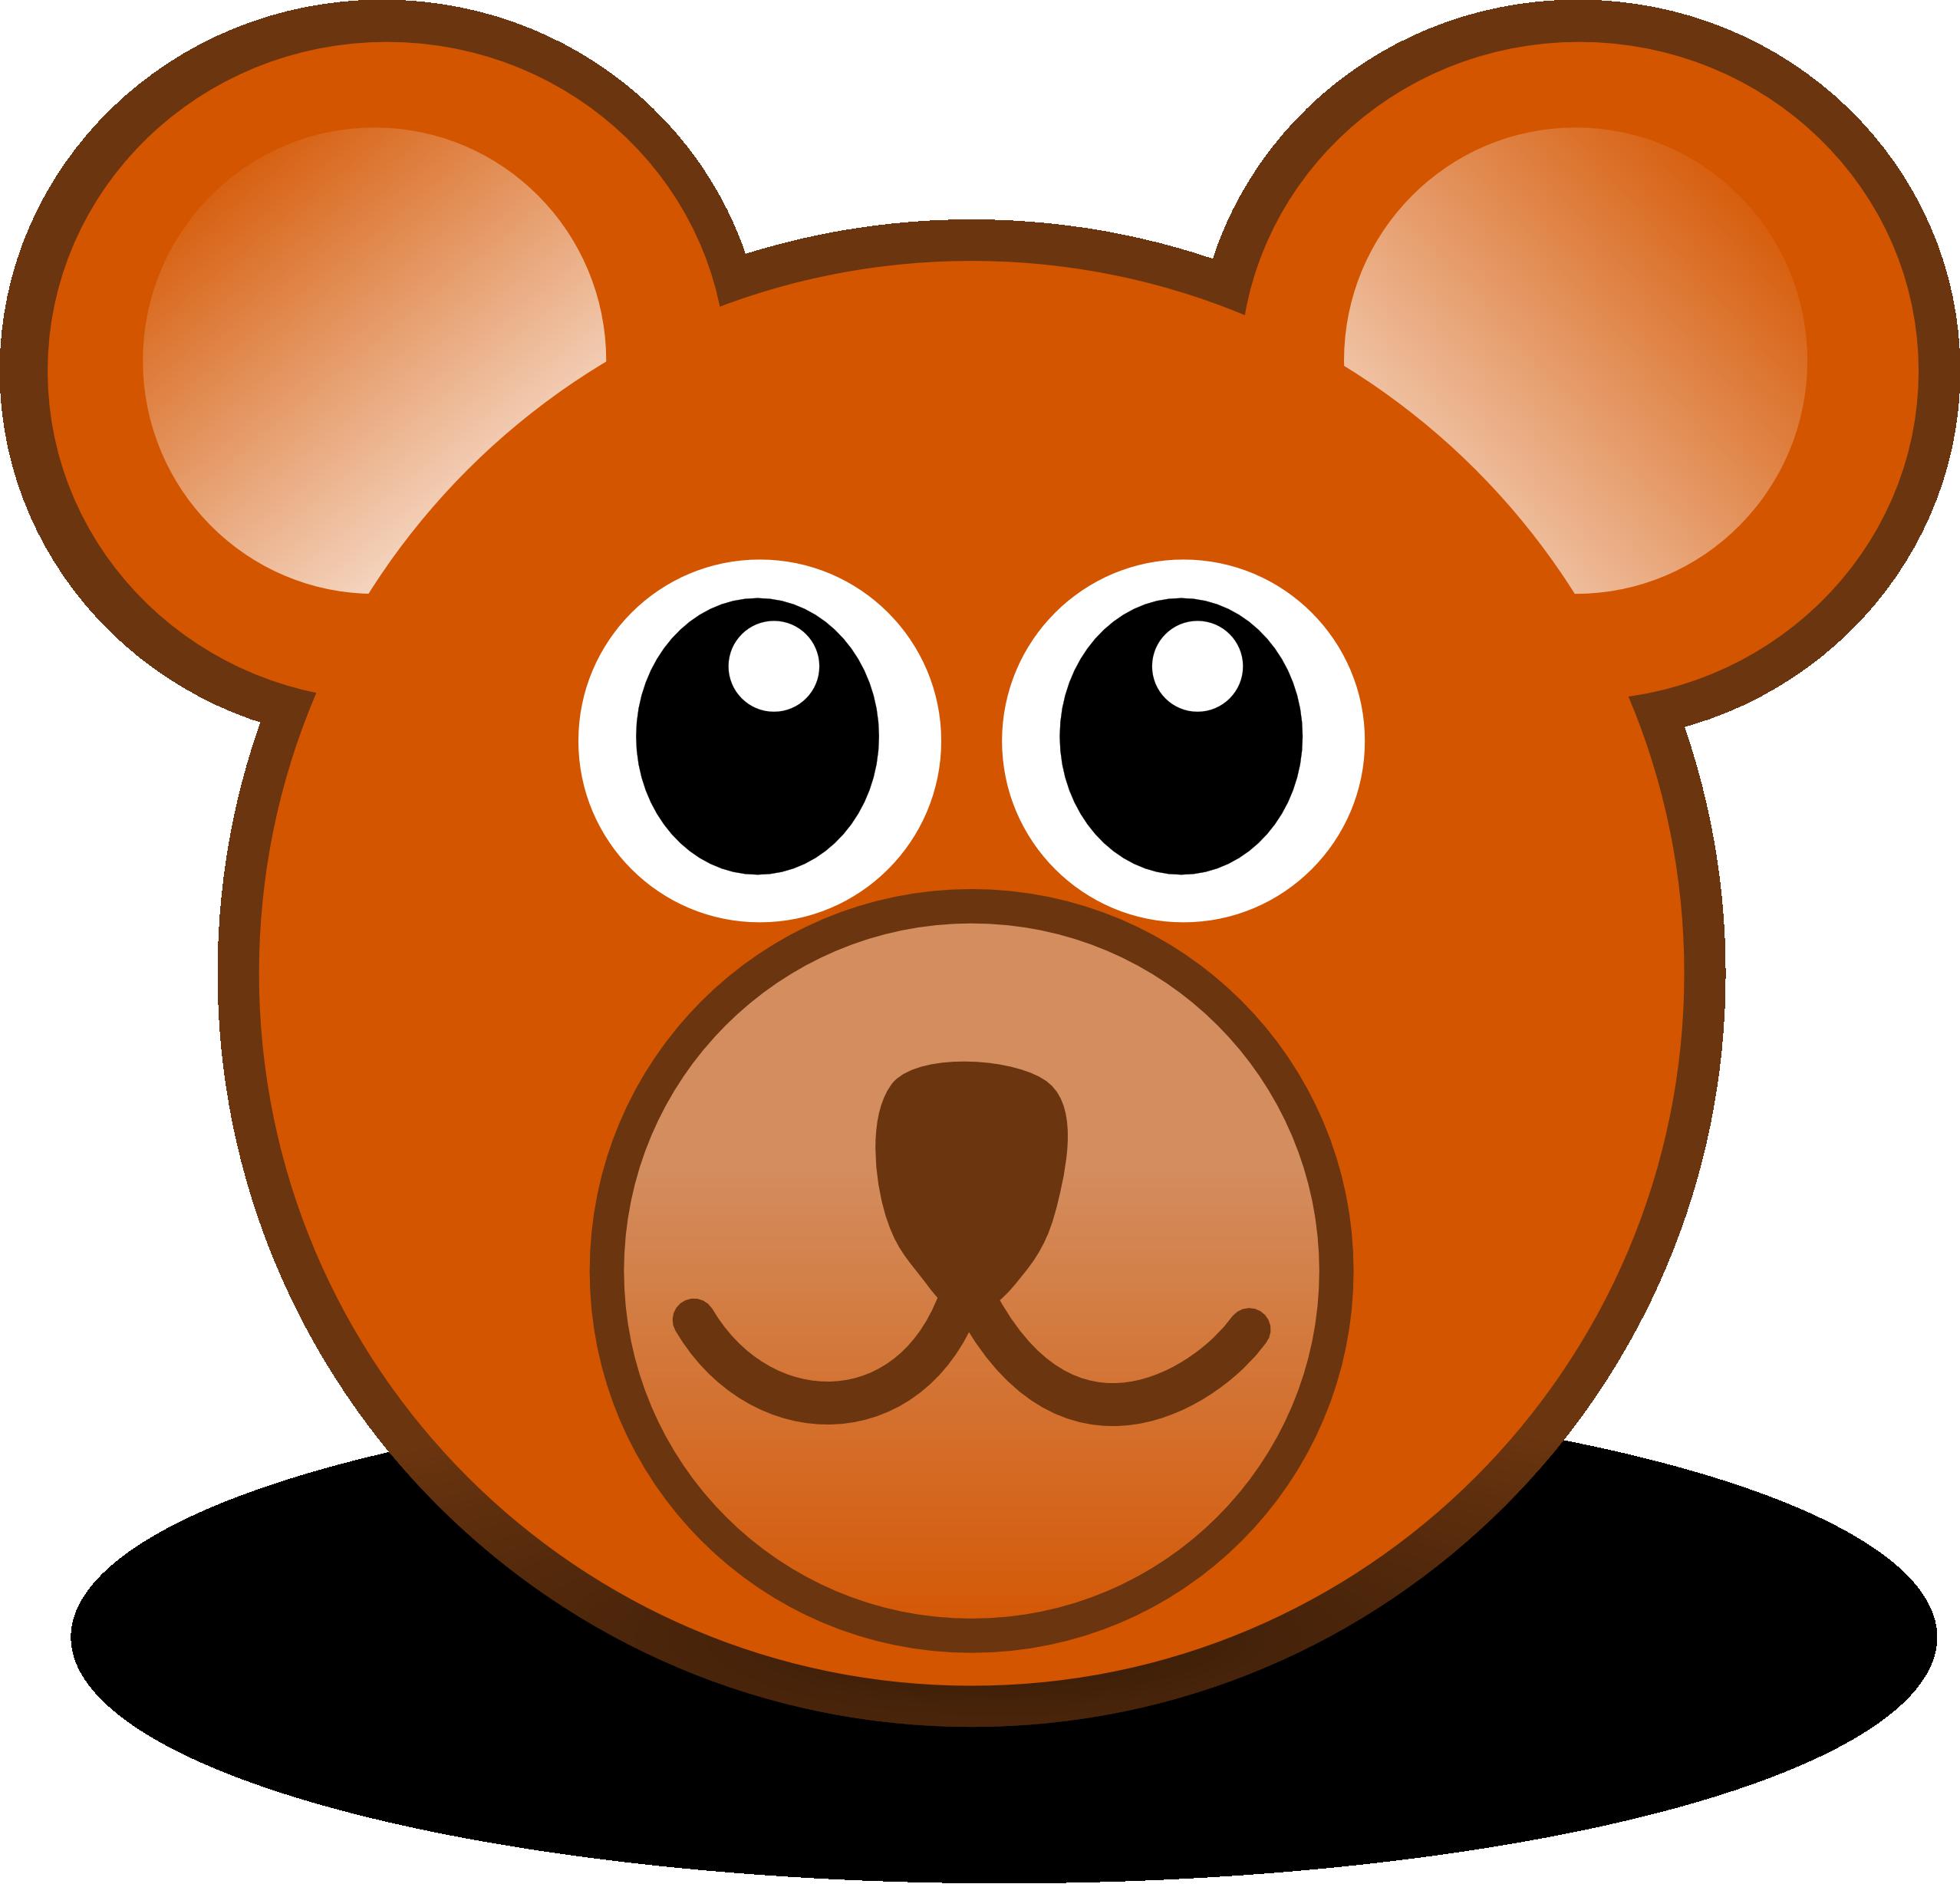 Teddy Bear Face Clip Art N8 free image.